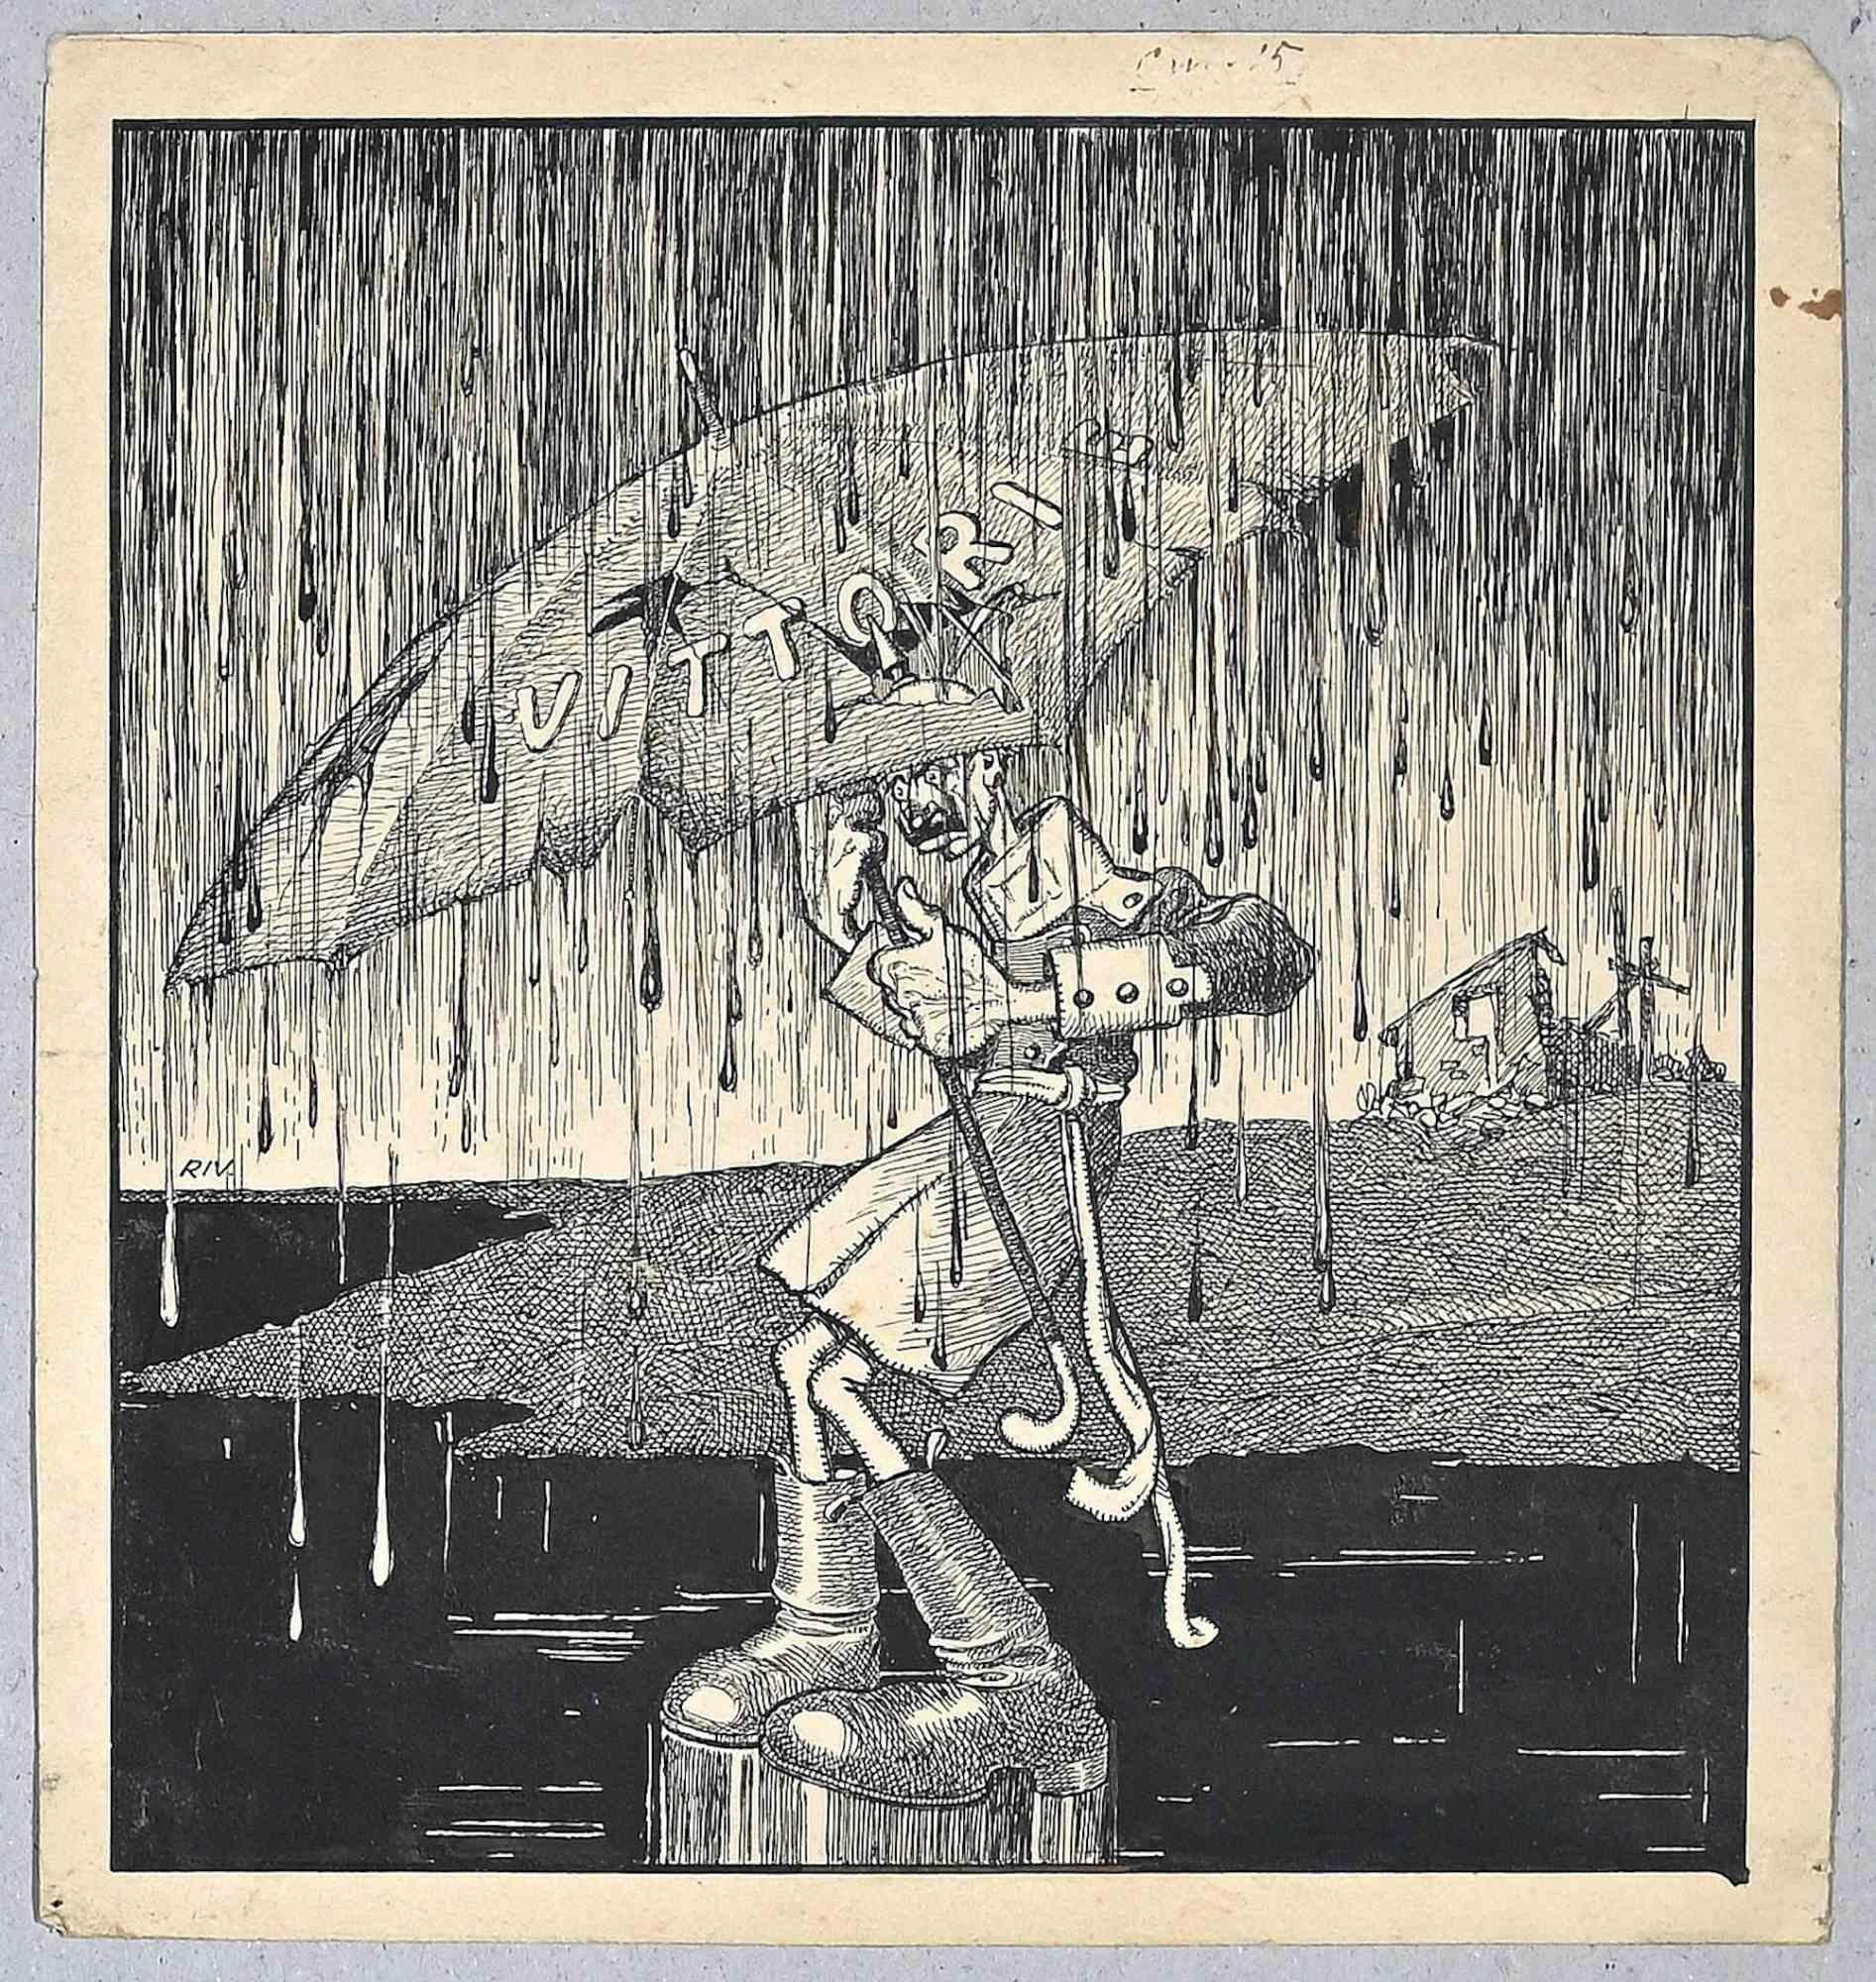 Vittorie - Original China Ink by Carlo Rivalta - 1918